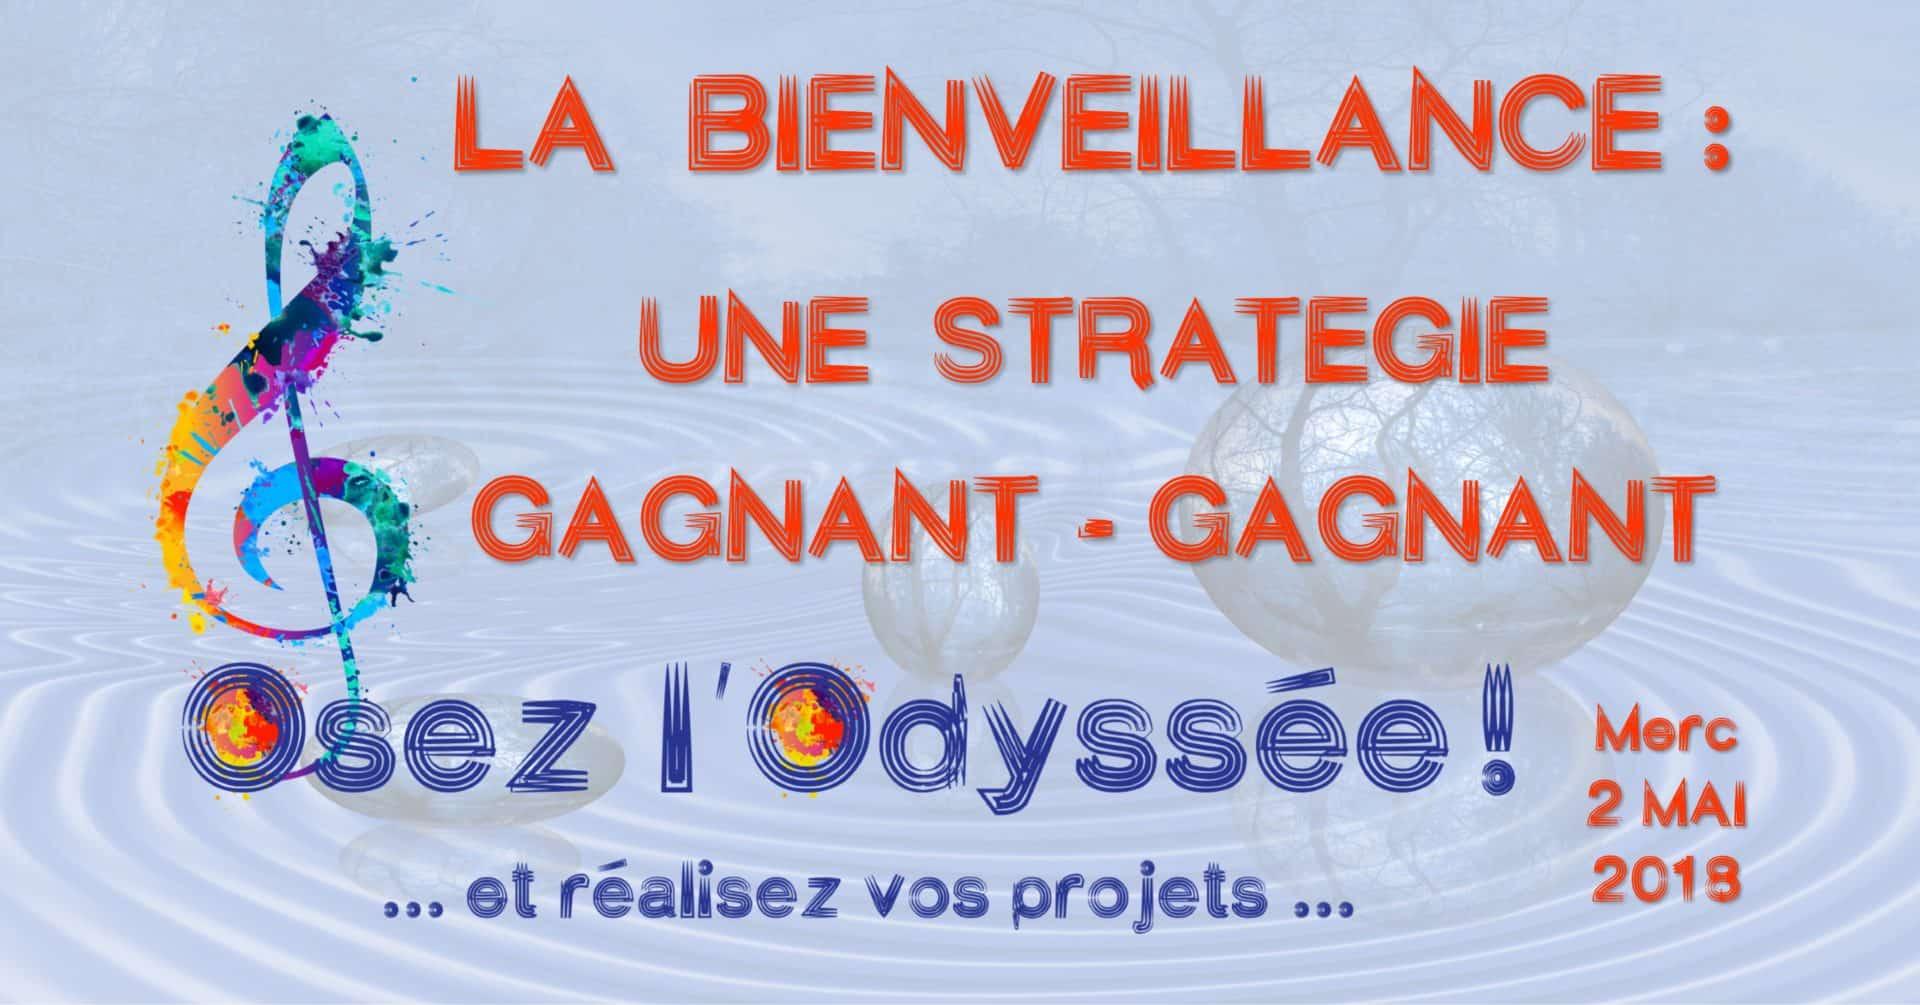 Bienveillance stratégie gagnante mai 2018 Coaching Osez l'Odyssée